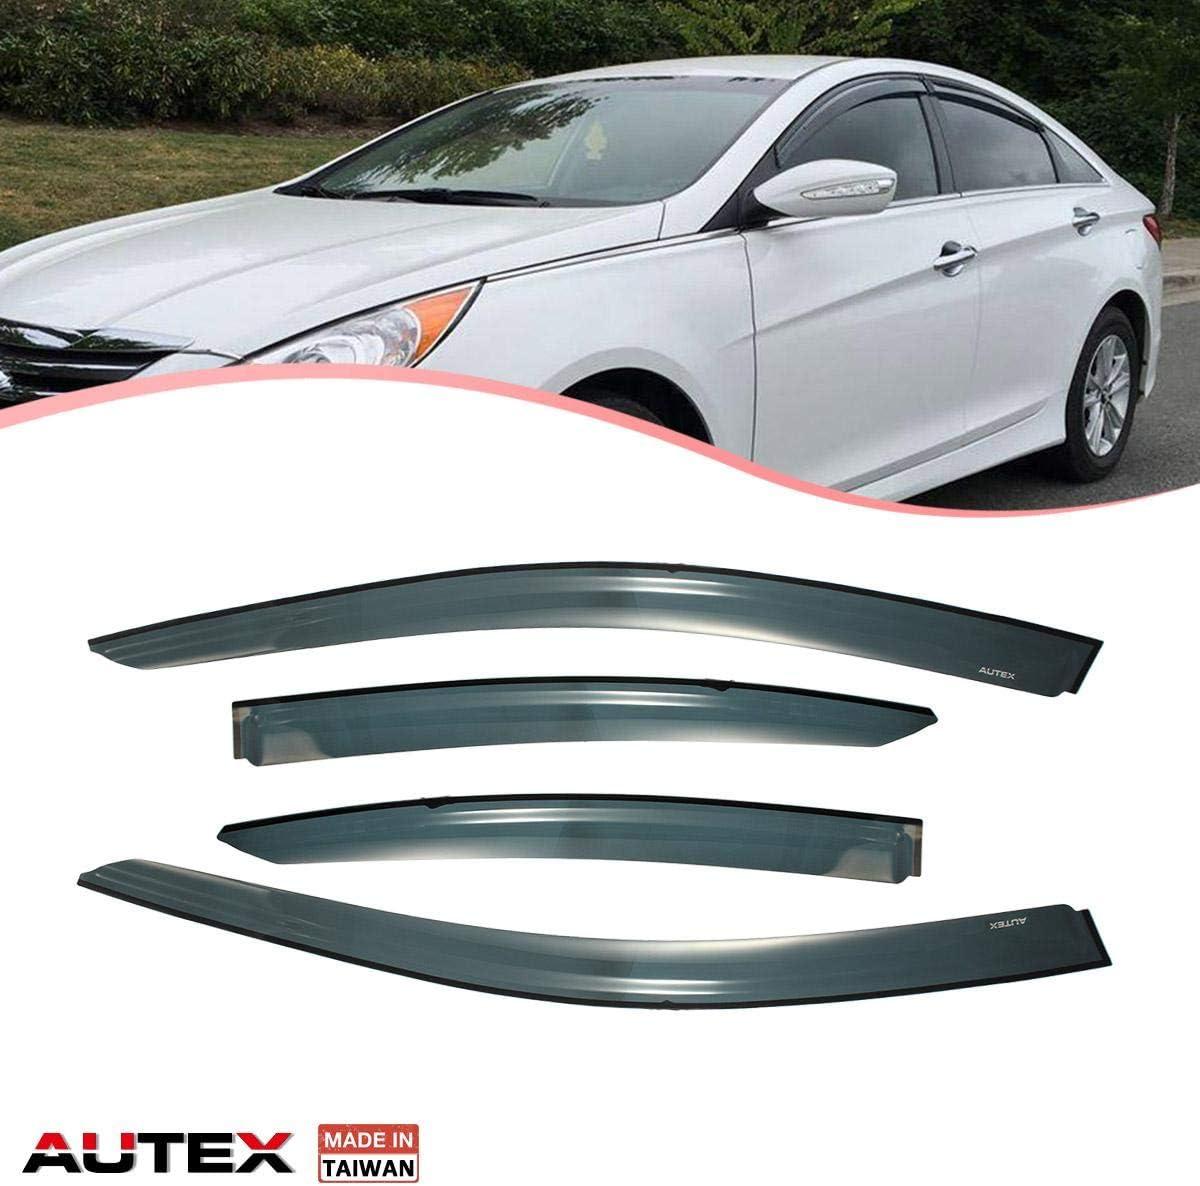 Amazon Com Autex Tape On Window Visor Compatible With Hyundai Sonata 2015 2016 2017 2018 Side Window Wind Deflector Sun Rain Guard Automotive